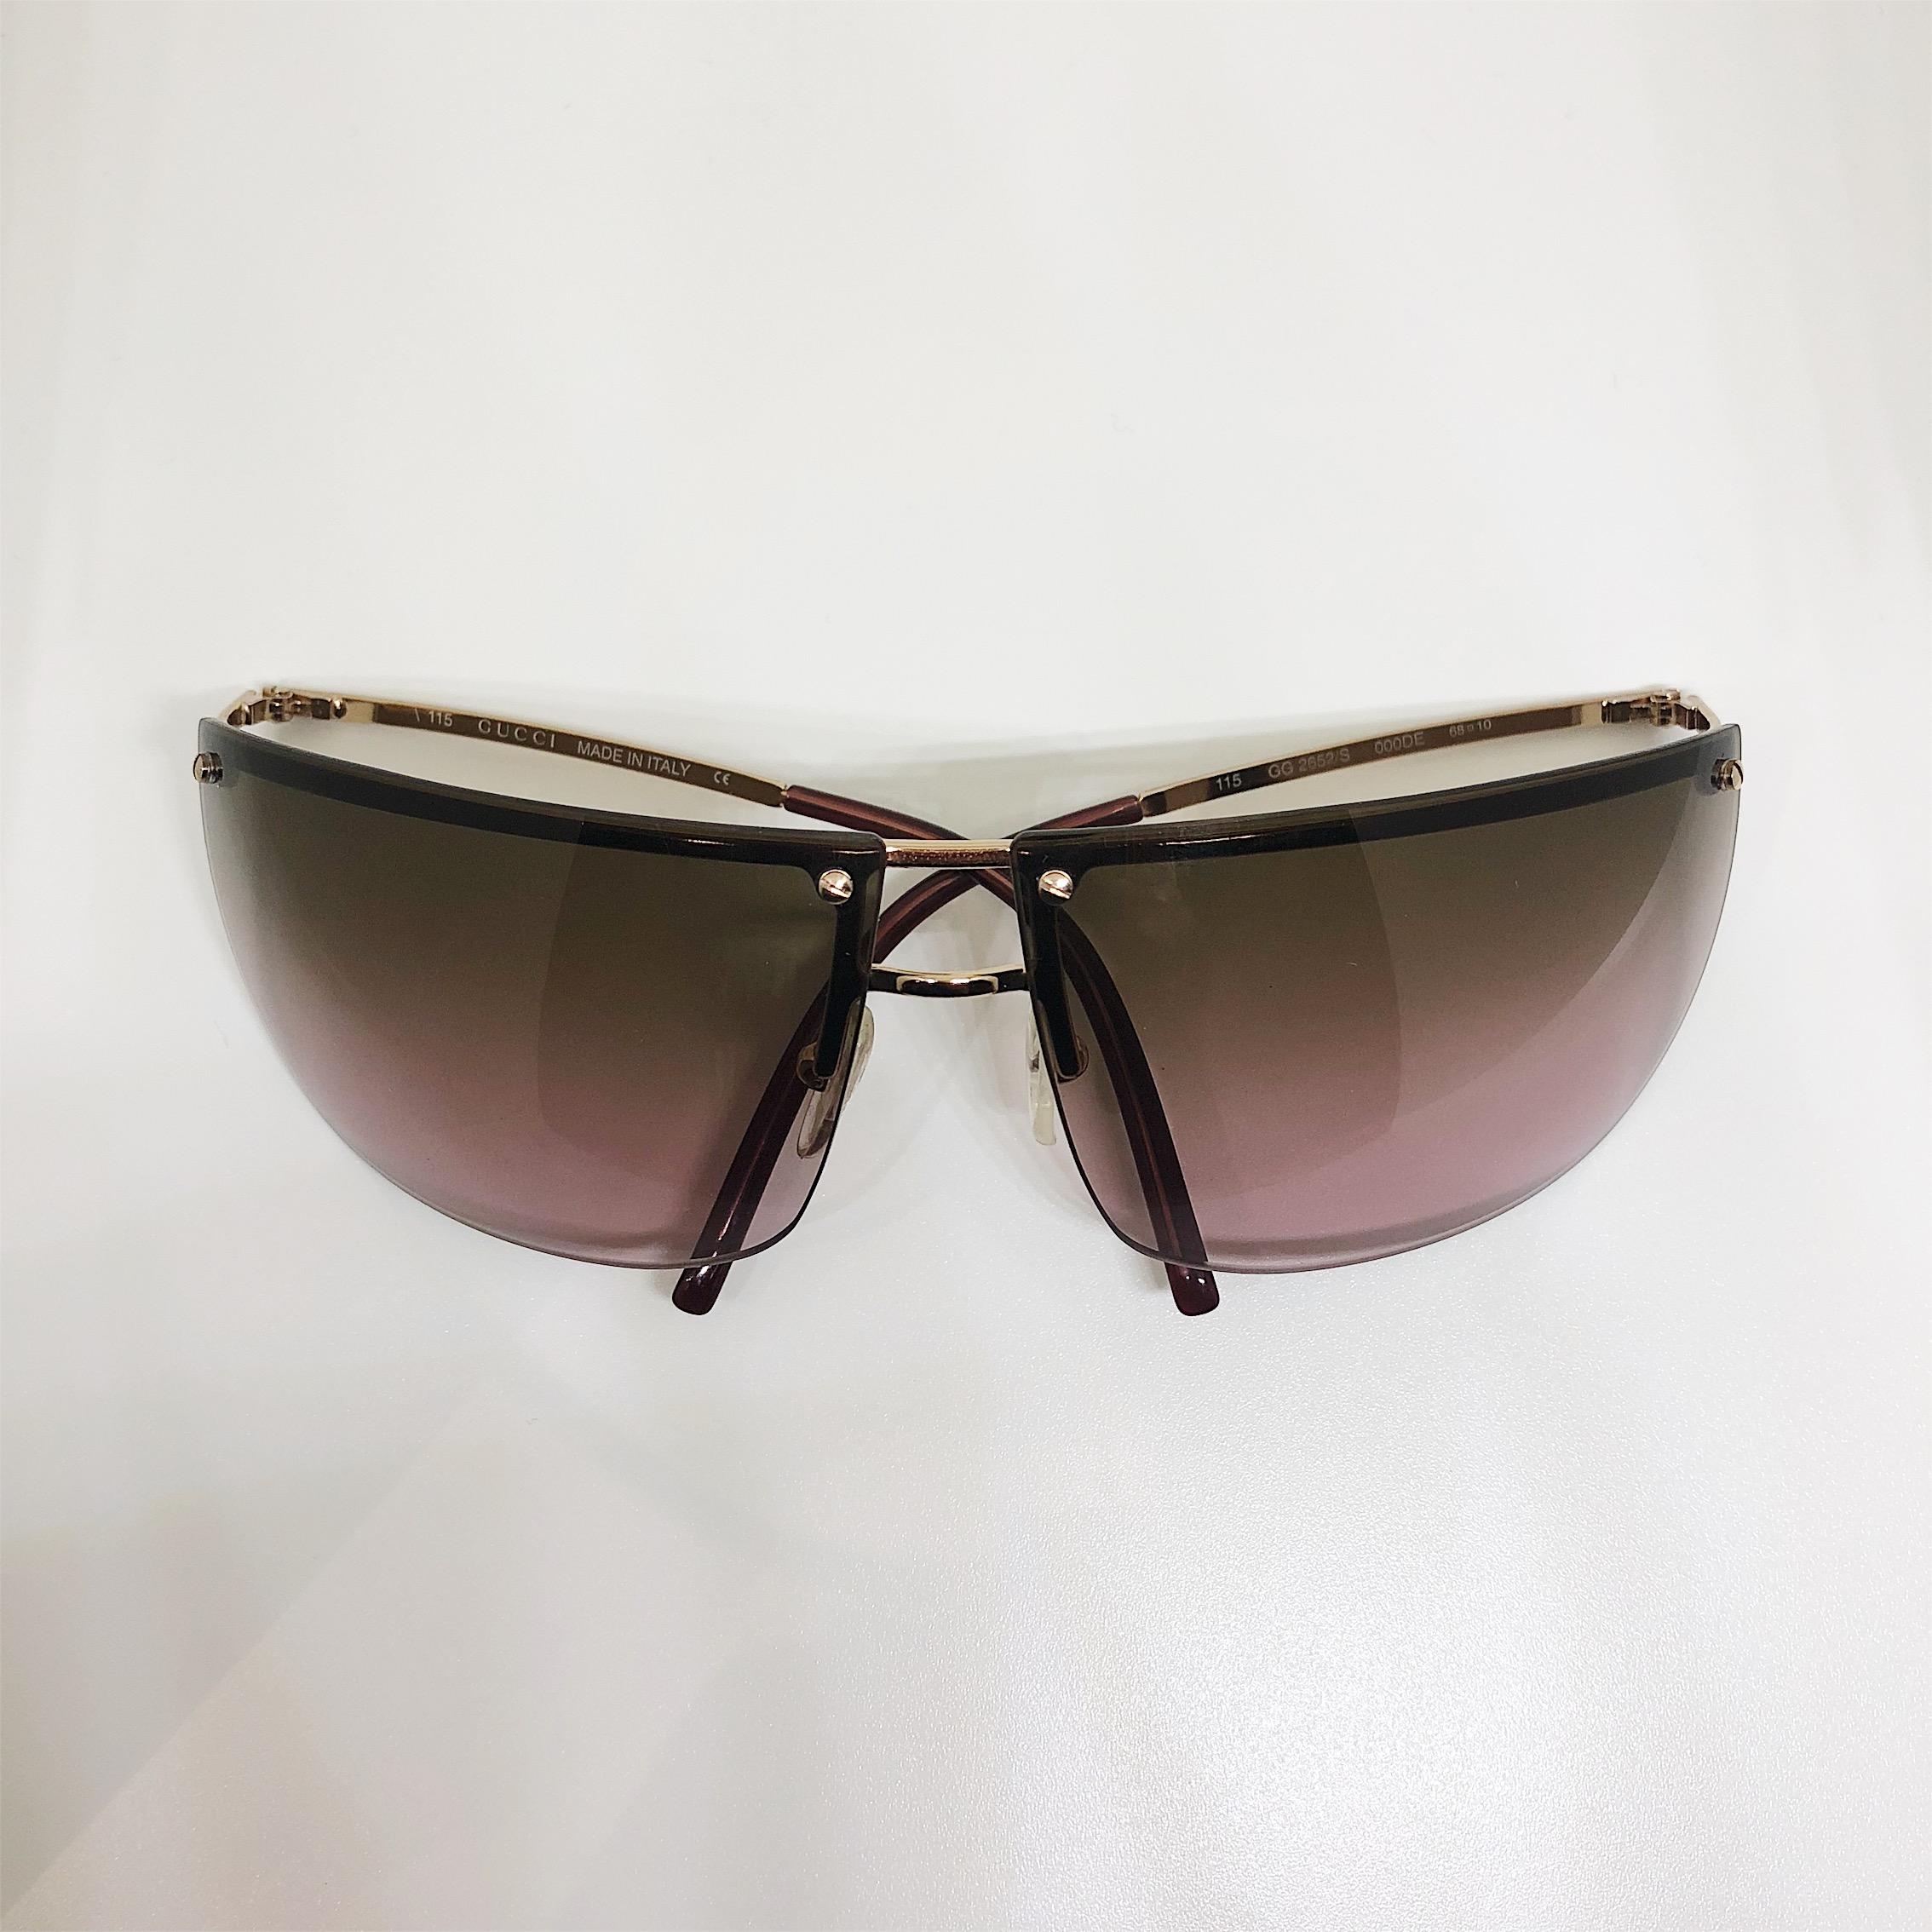 9bba4a1c6c1b Accessories| Lunettes London Gucci Rimless Gradient Glasses | 1n1 ...